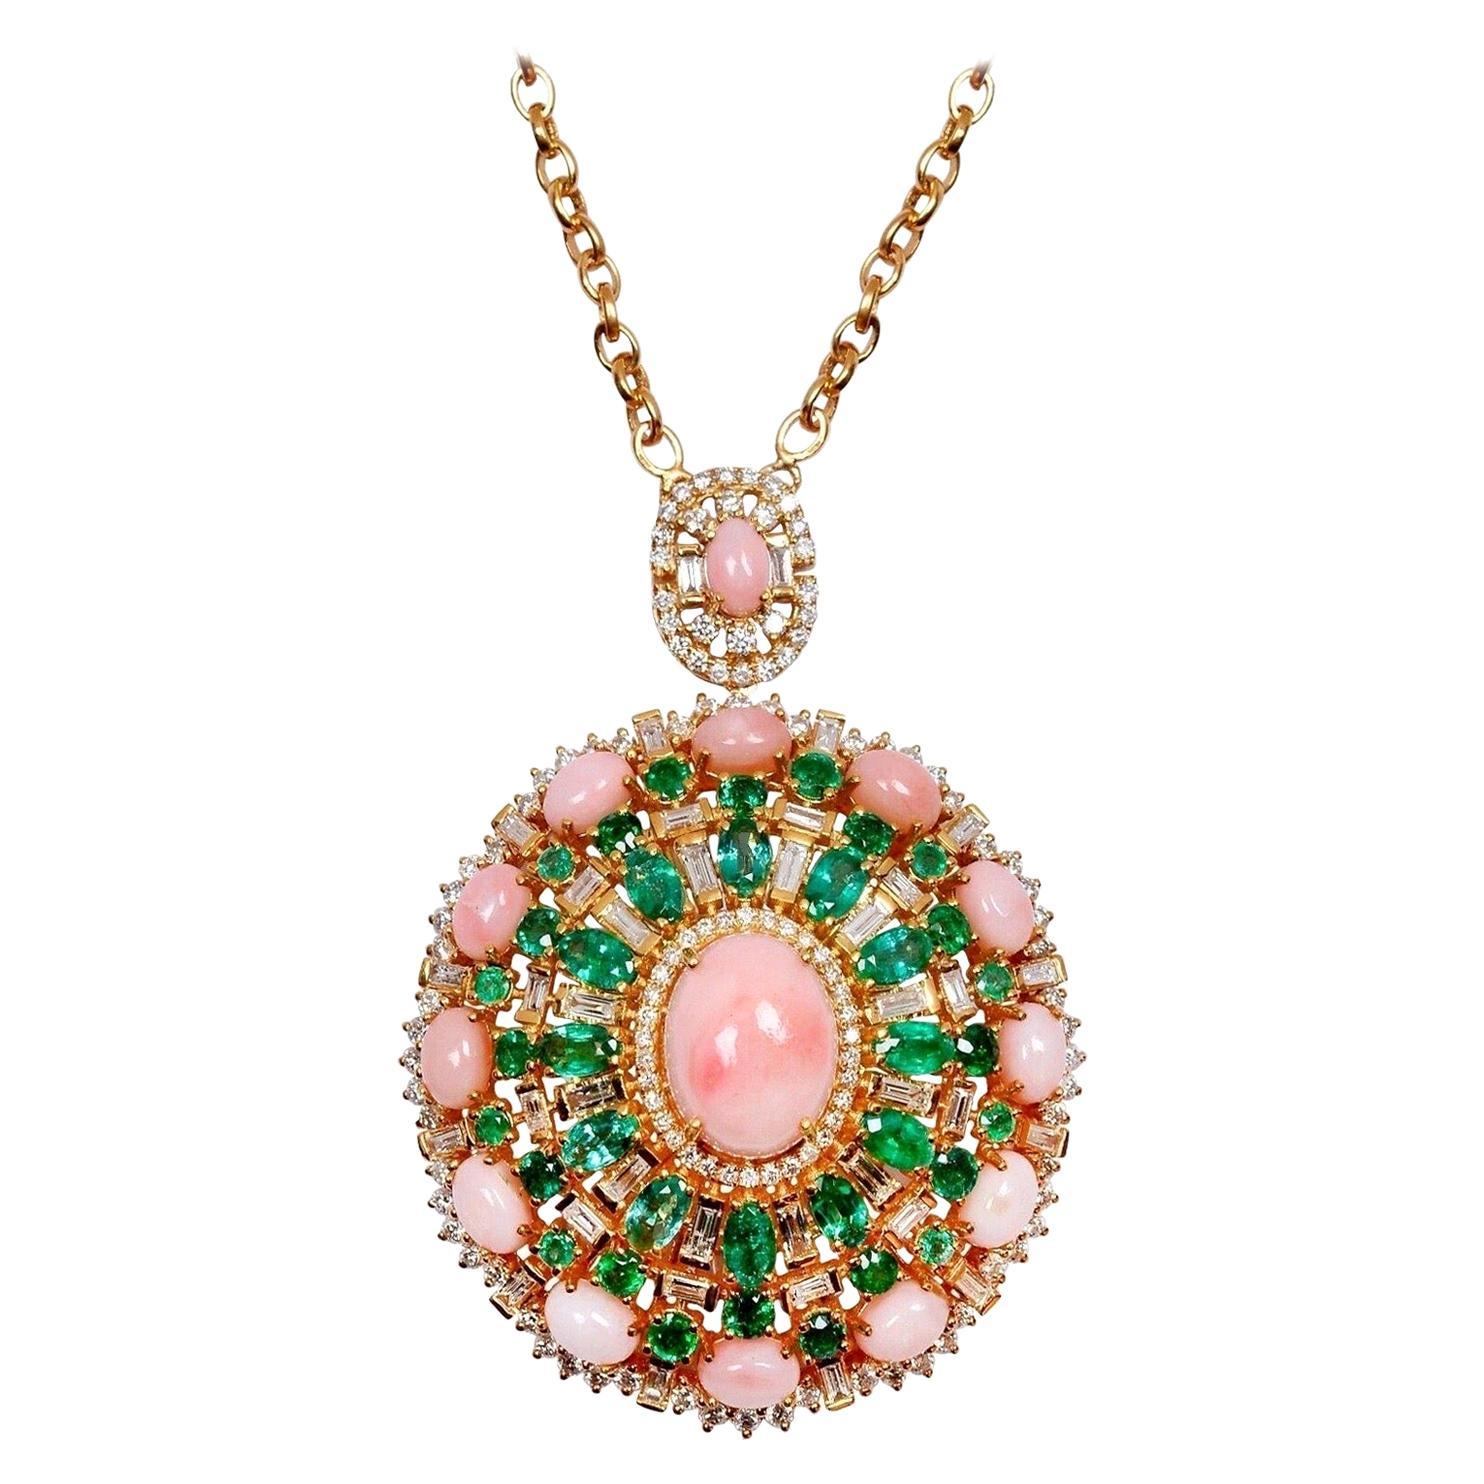 16.40 Pink Opal Emerald Diamond 18 Karat Gold Pendant Necklace